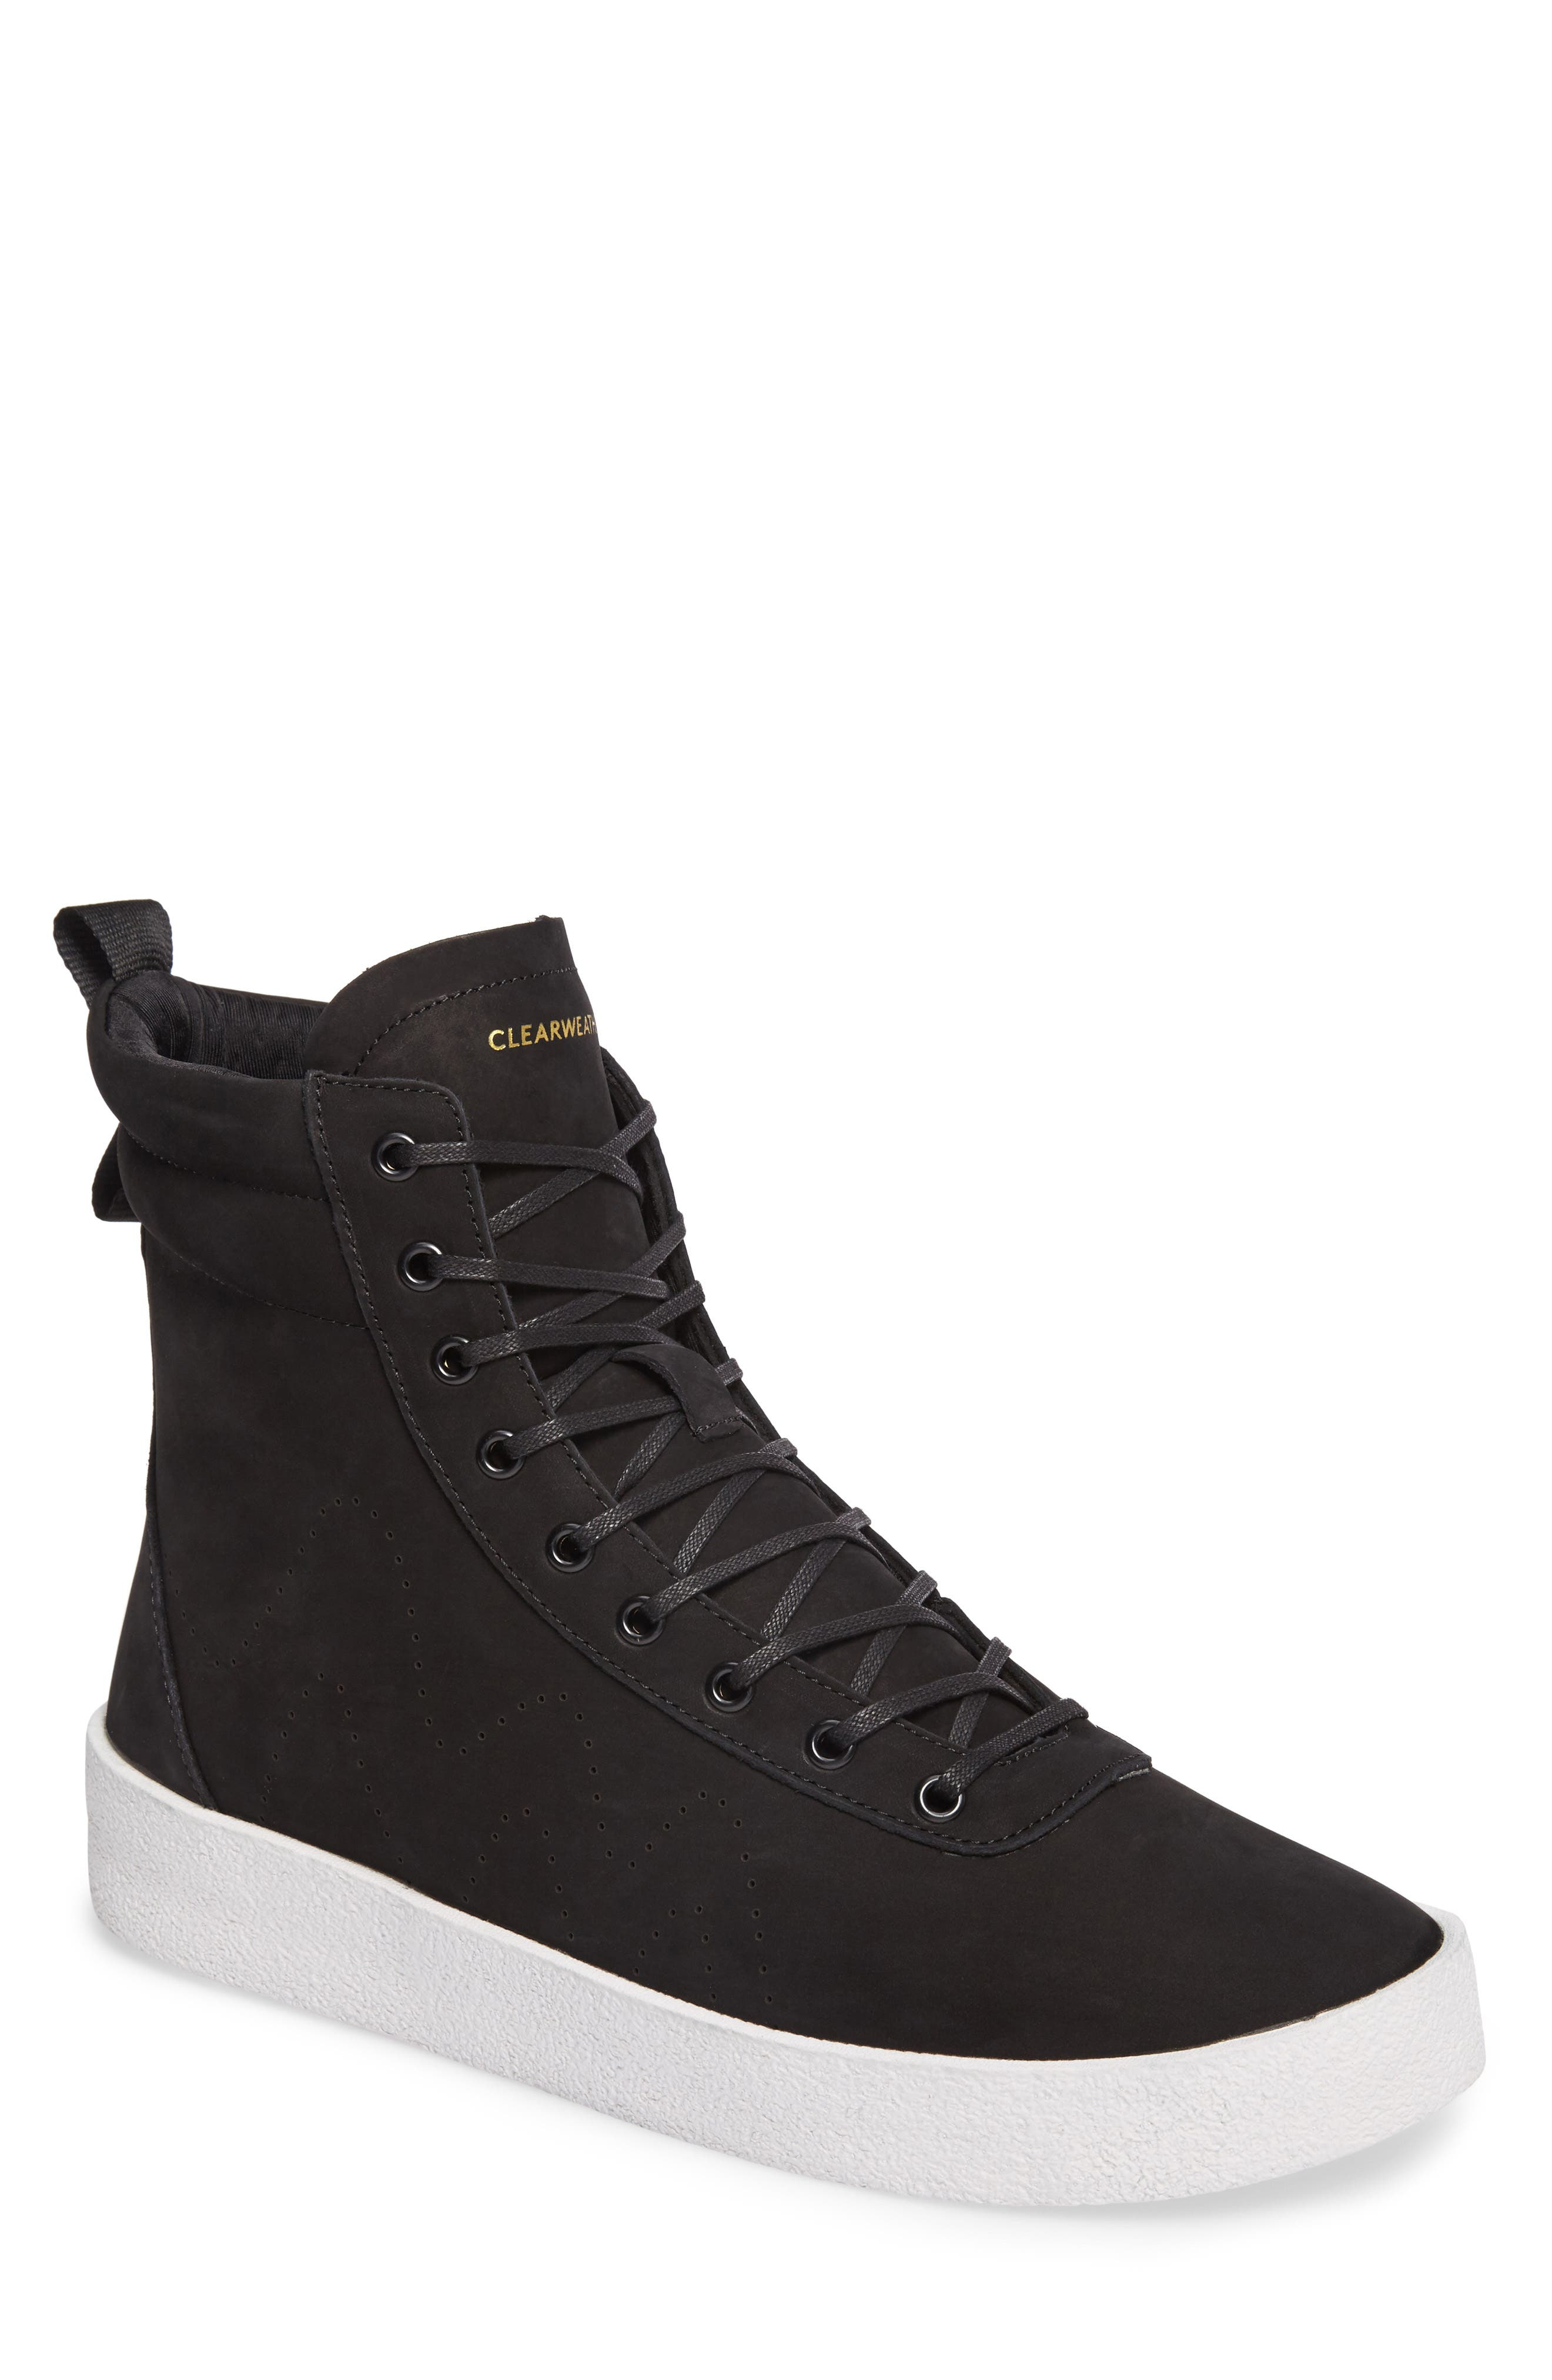 Highlander High Top Sneaker,                         Main,                         color, 001